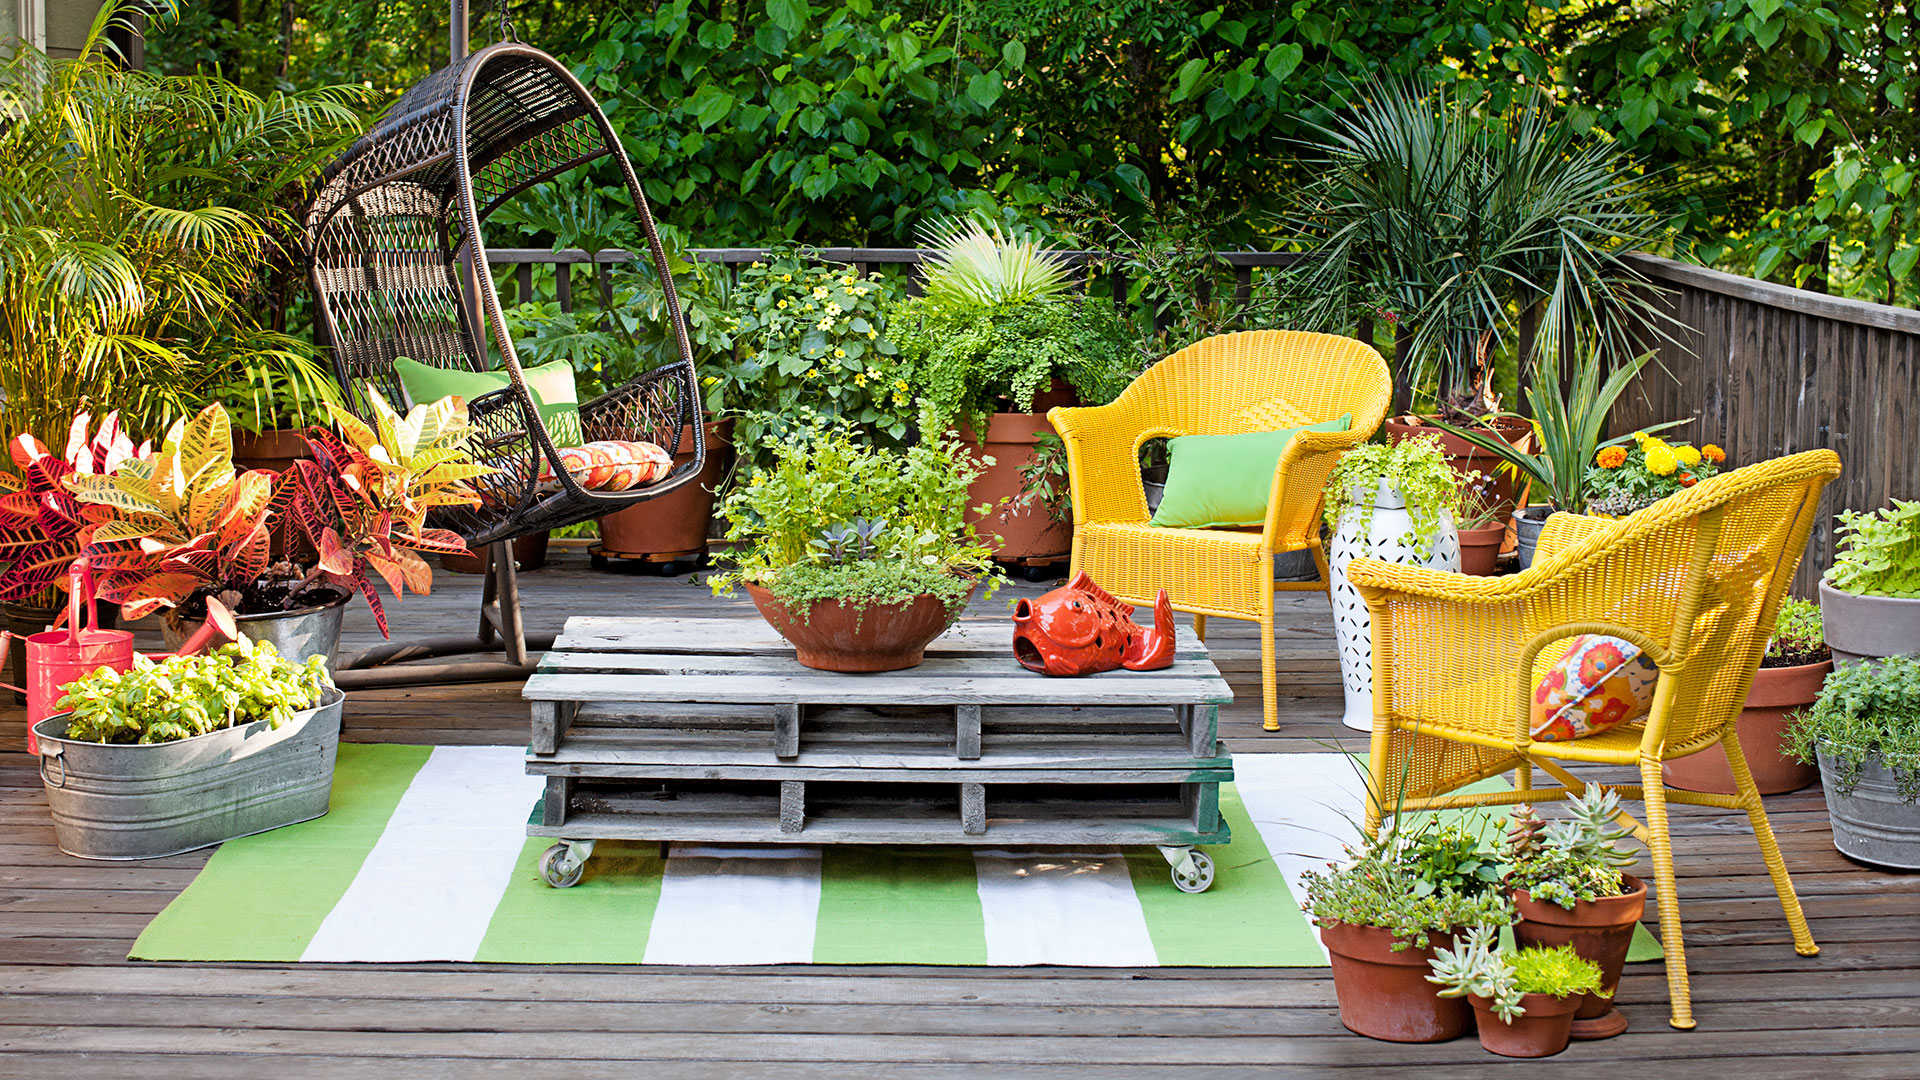 25 Backyard Decorating Ideas - Easy Gardening Tips and DIY ... on Easy Back Garden Ideas id=12544